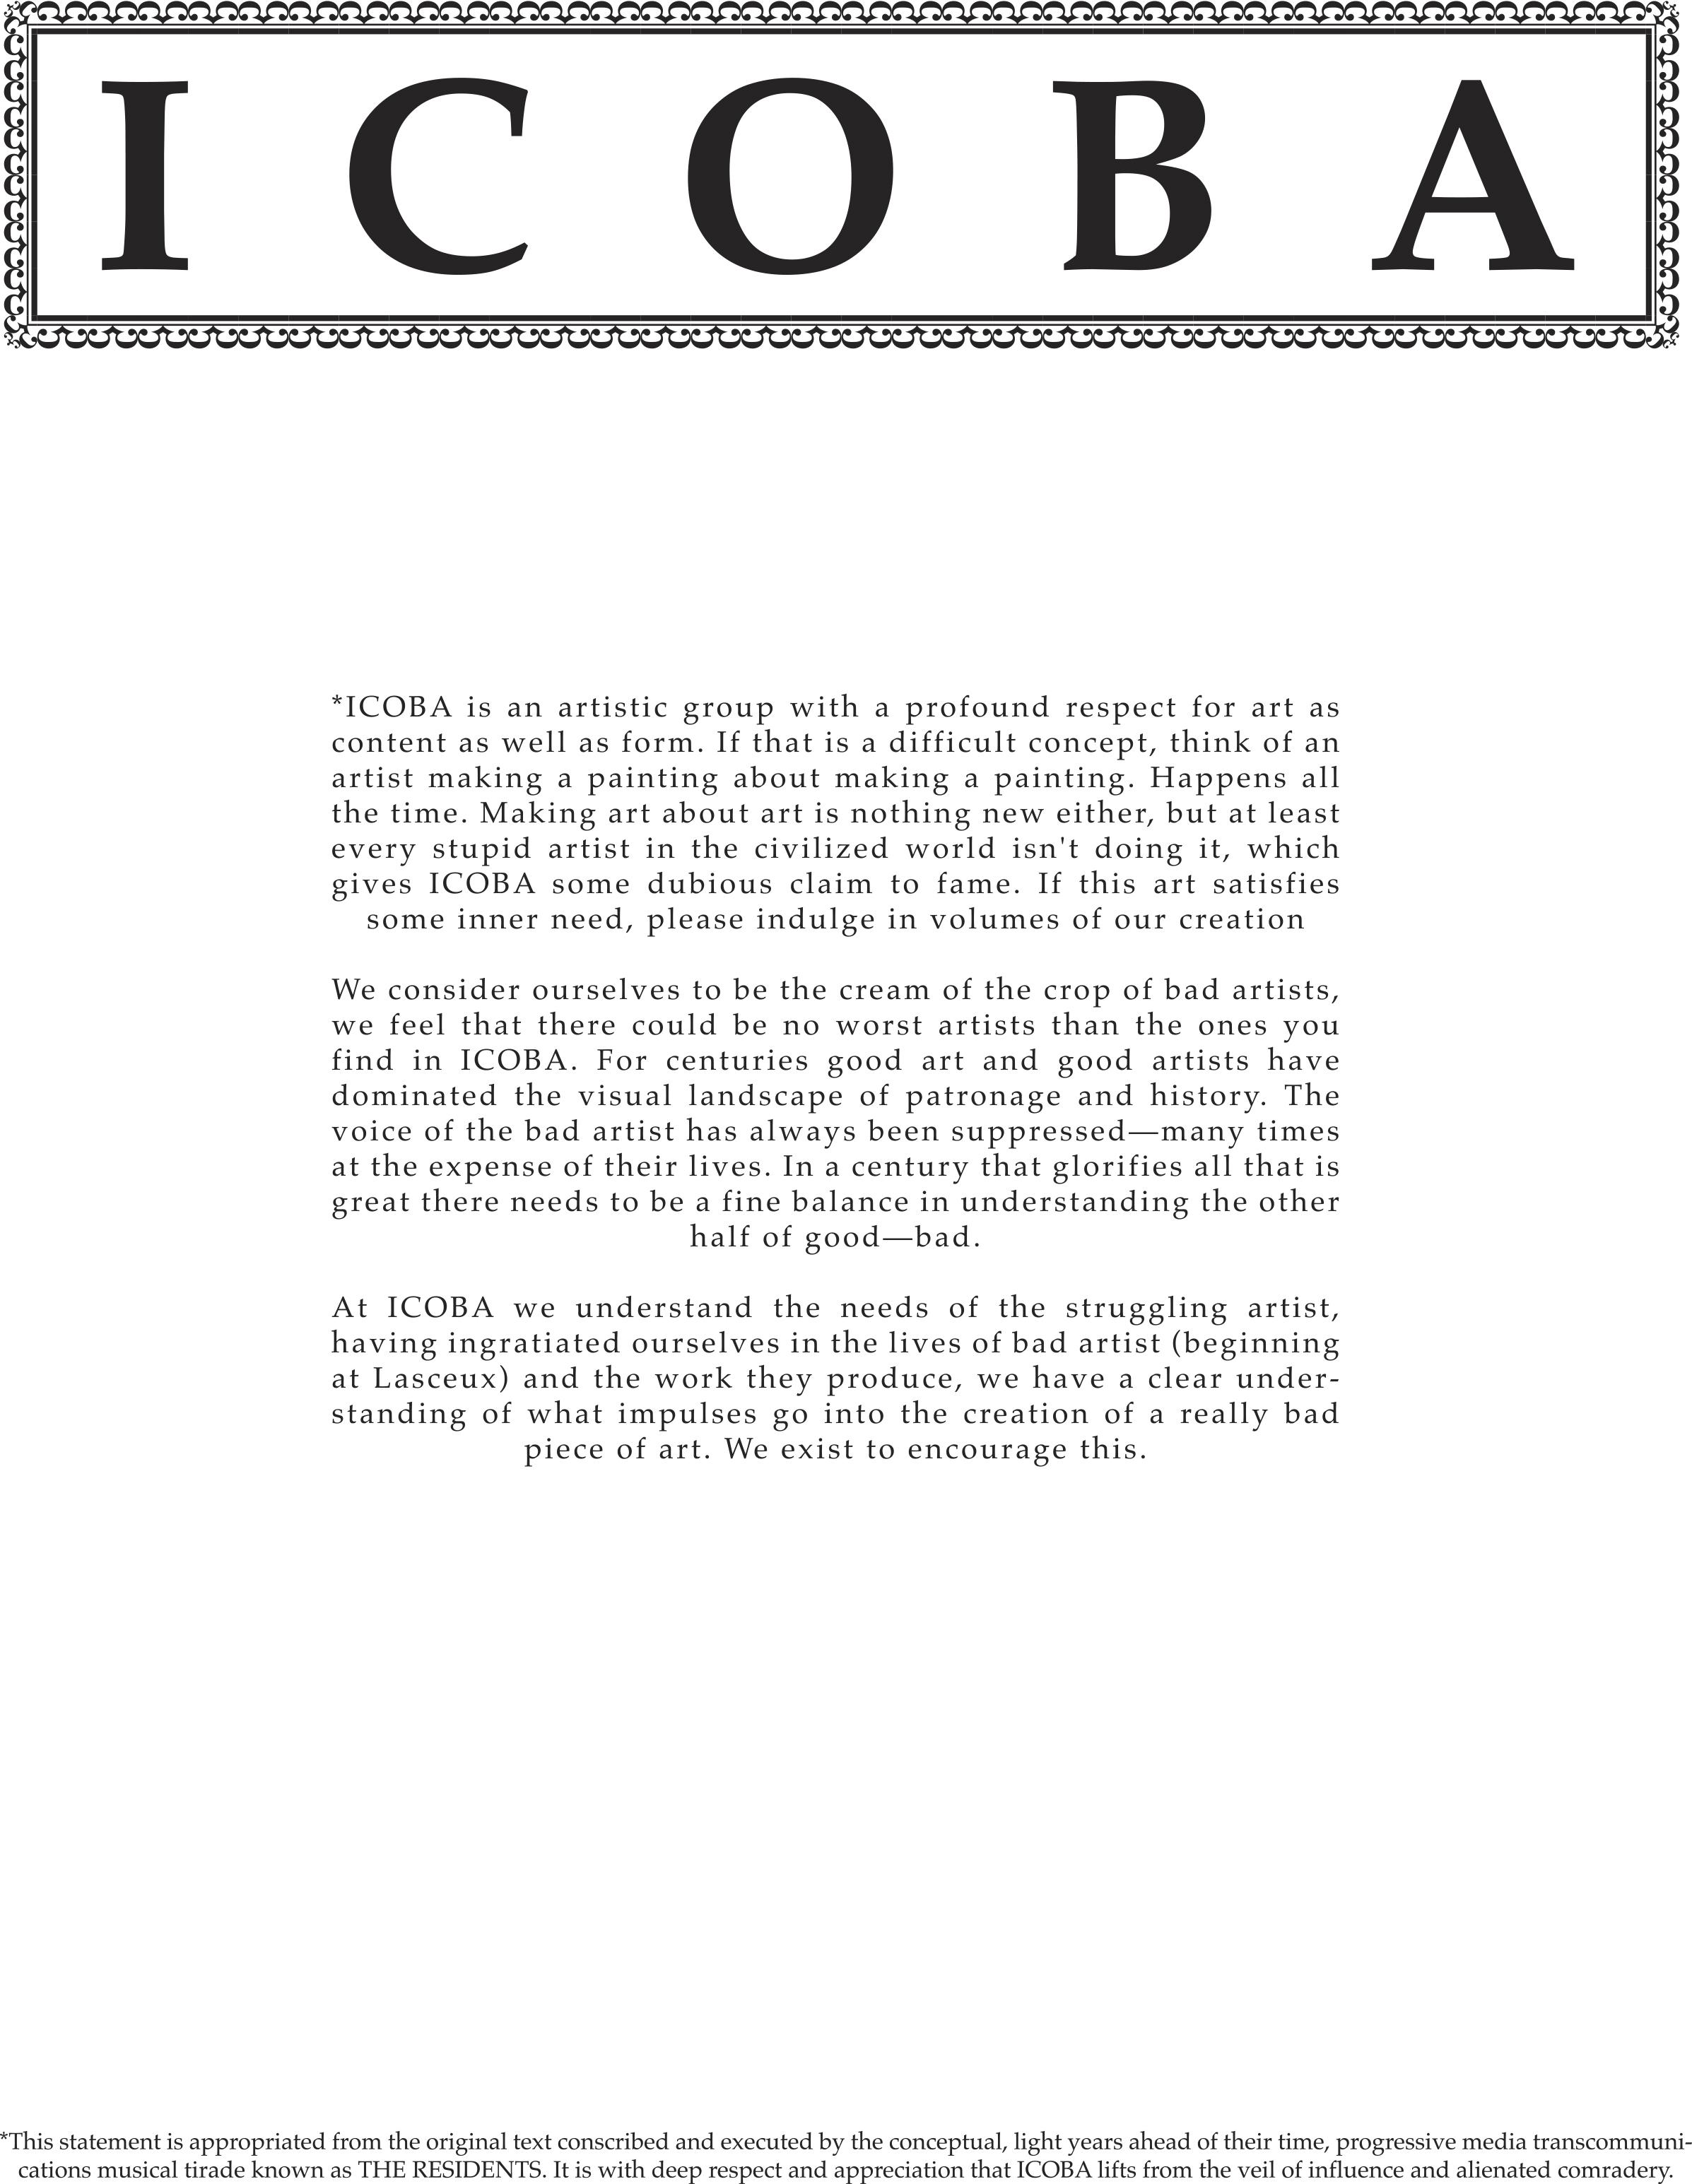 ICOBA_Statement.jpg